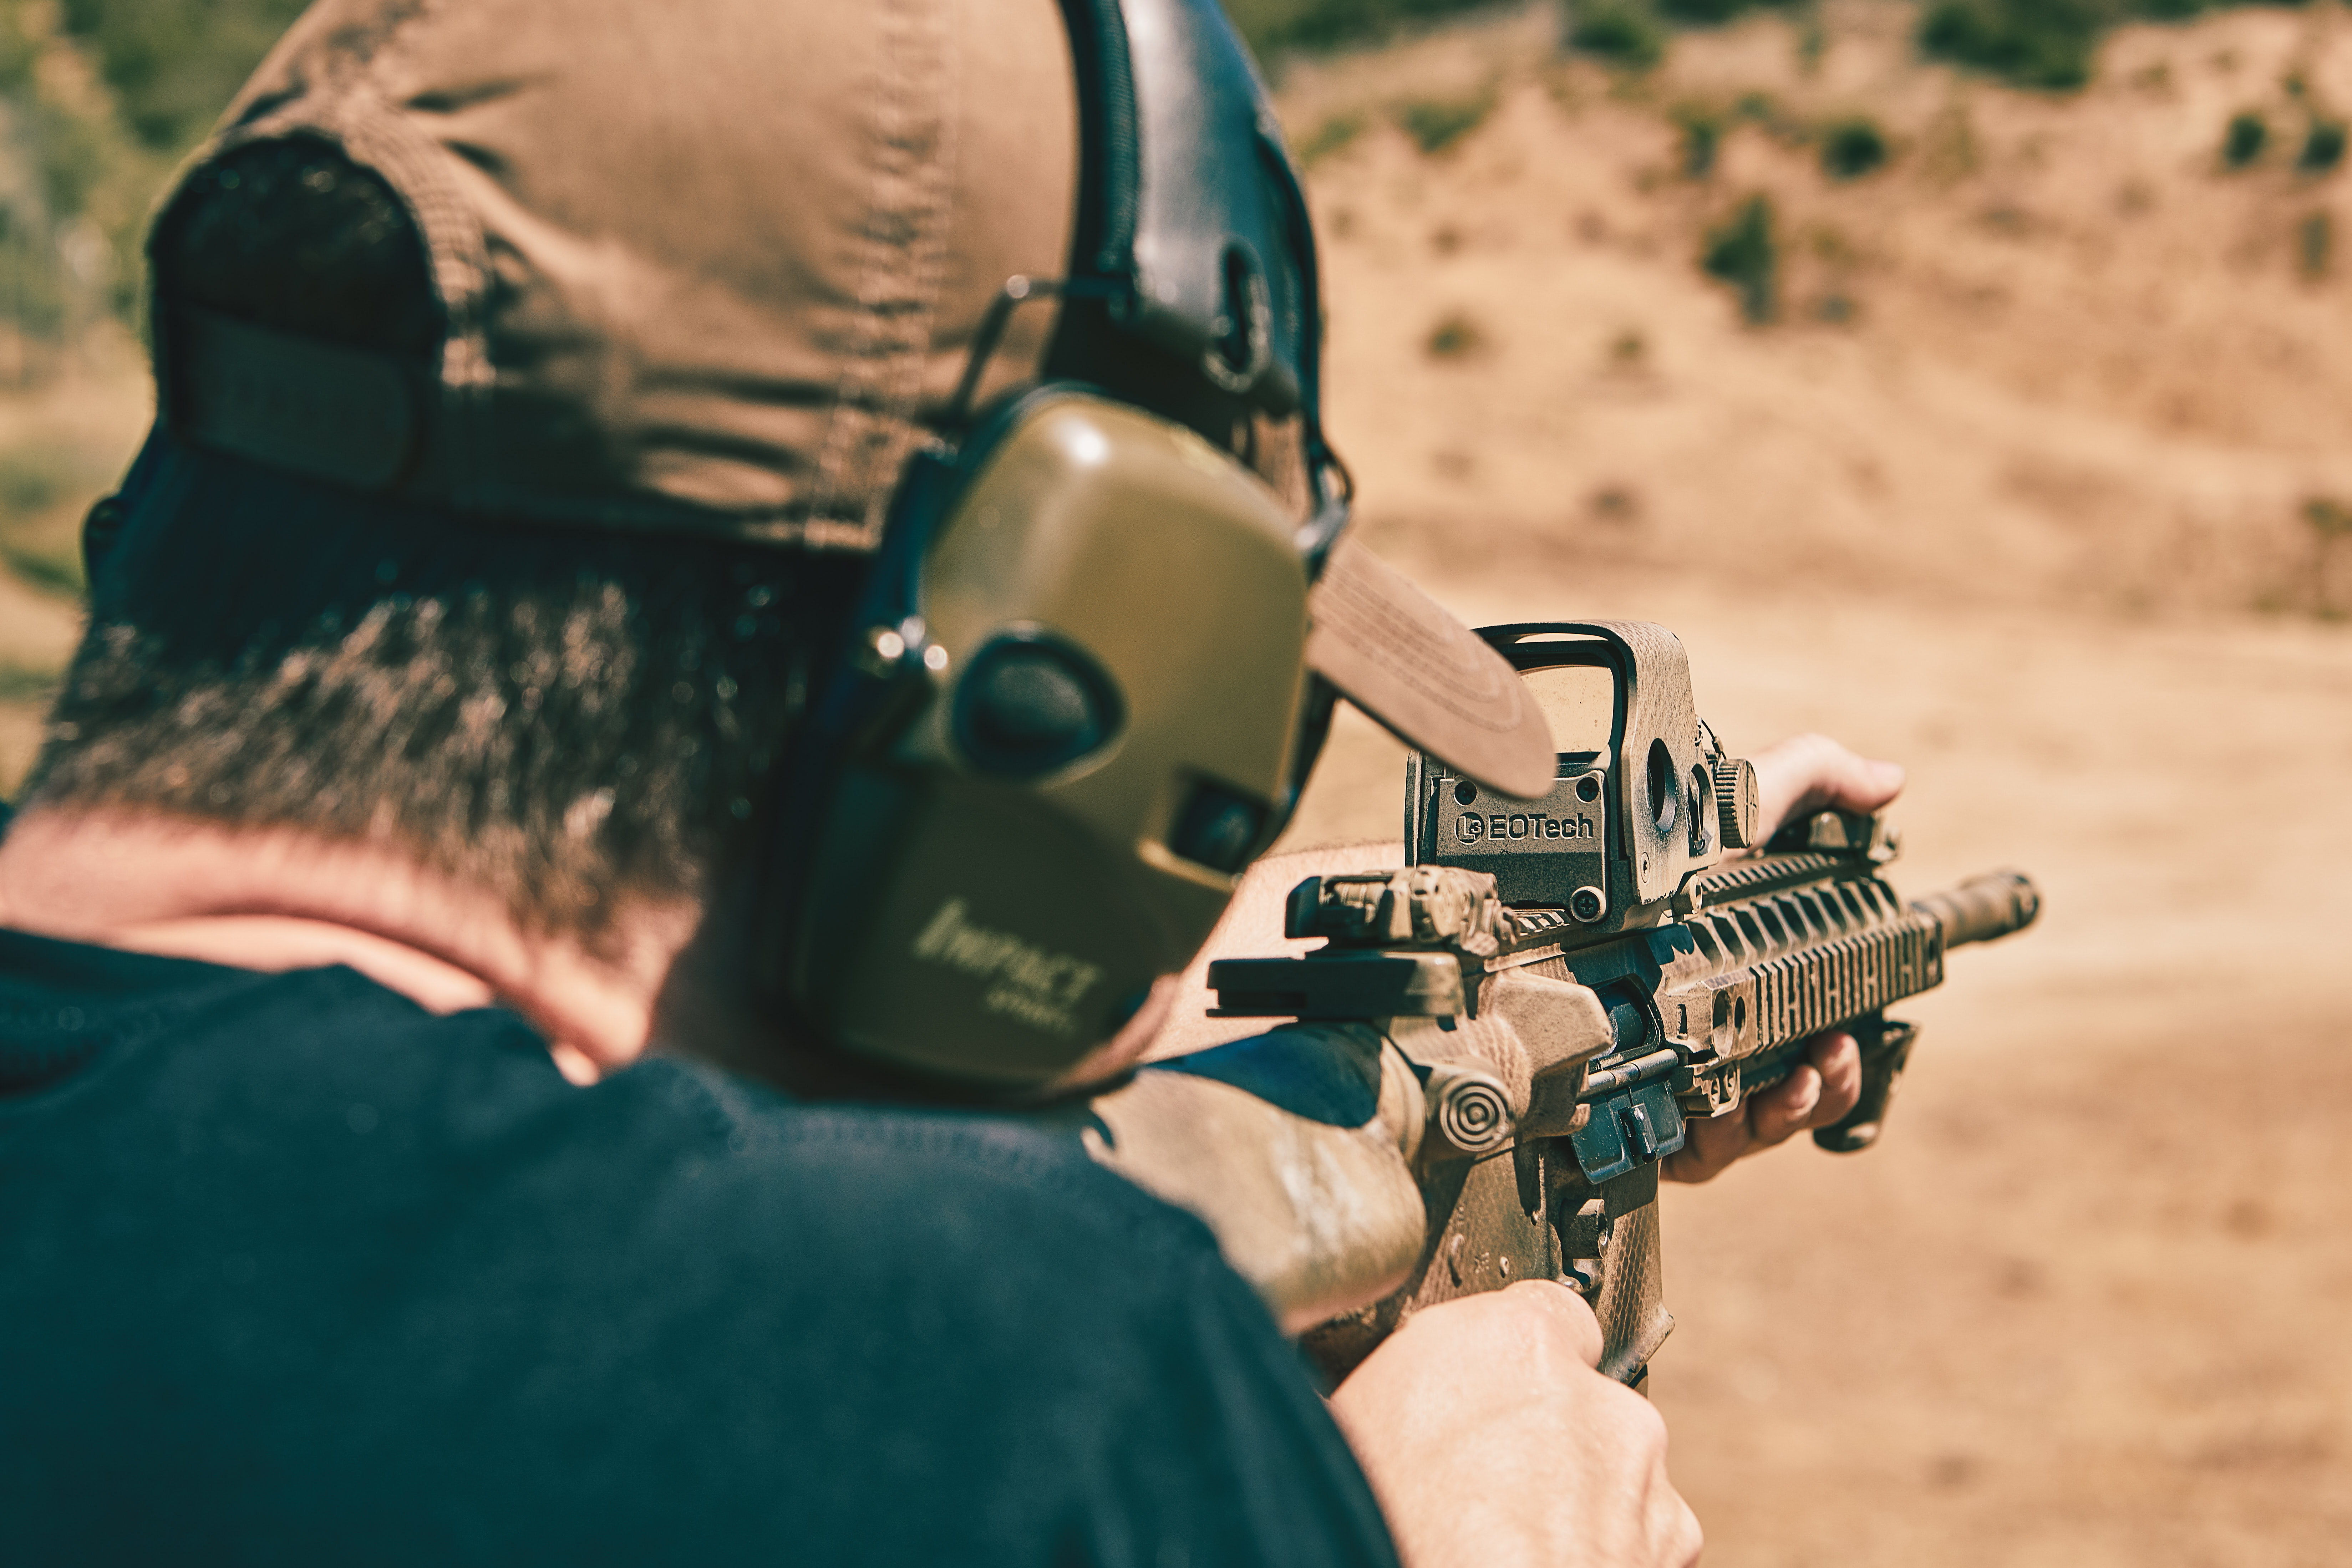 2018-05-14-Lance-Thibault-gun-range0030.